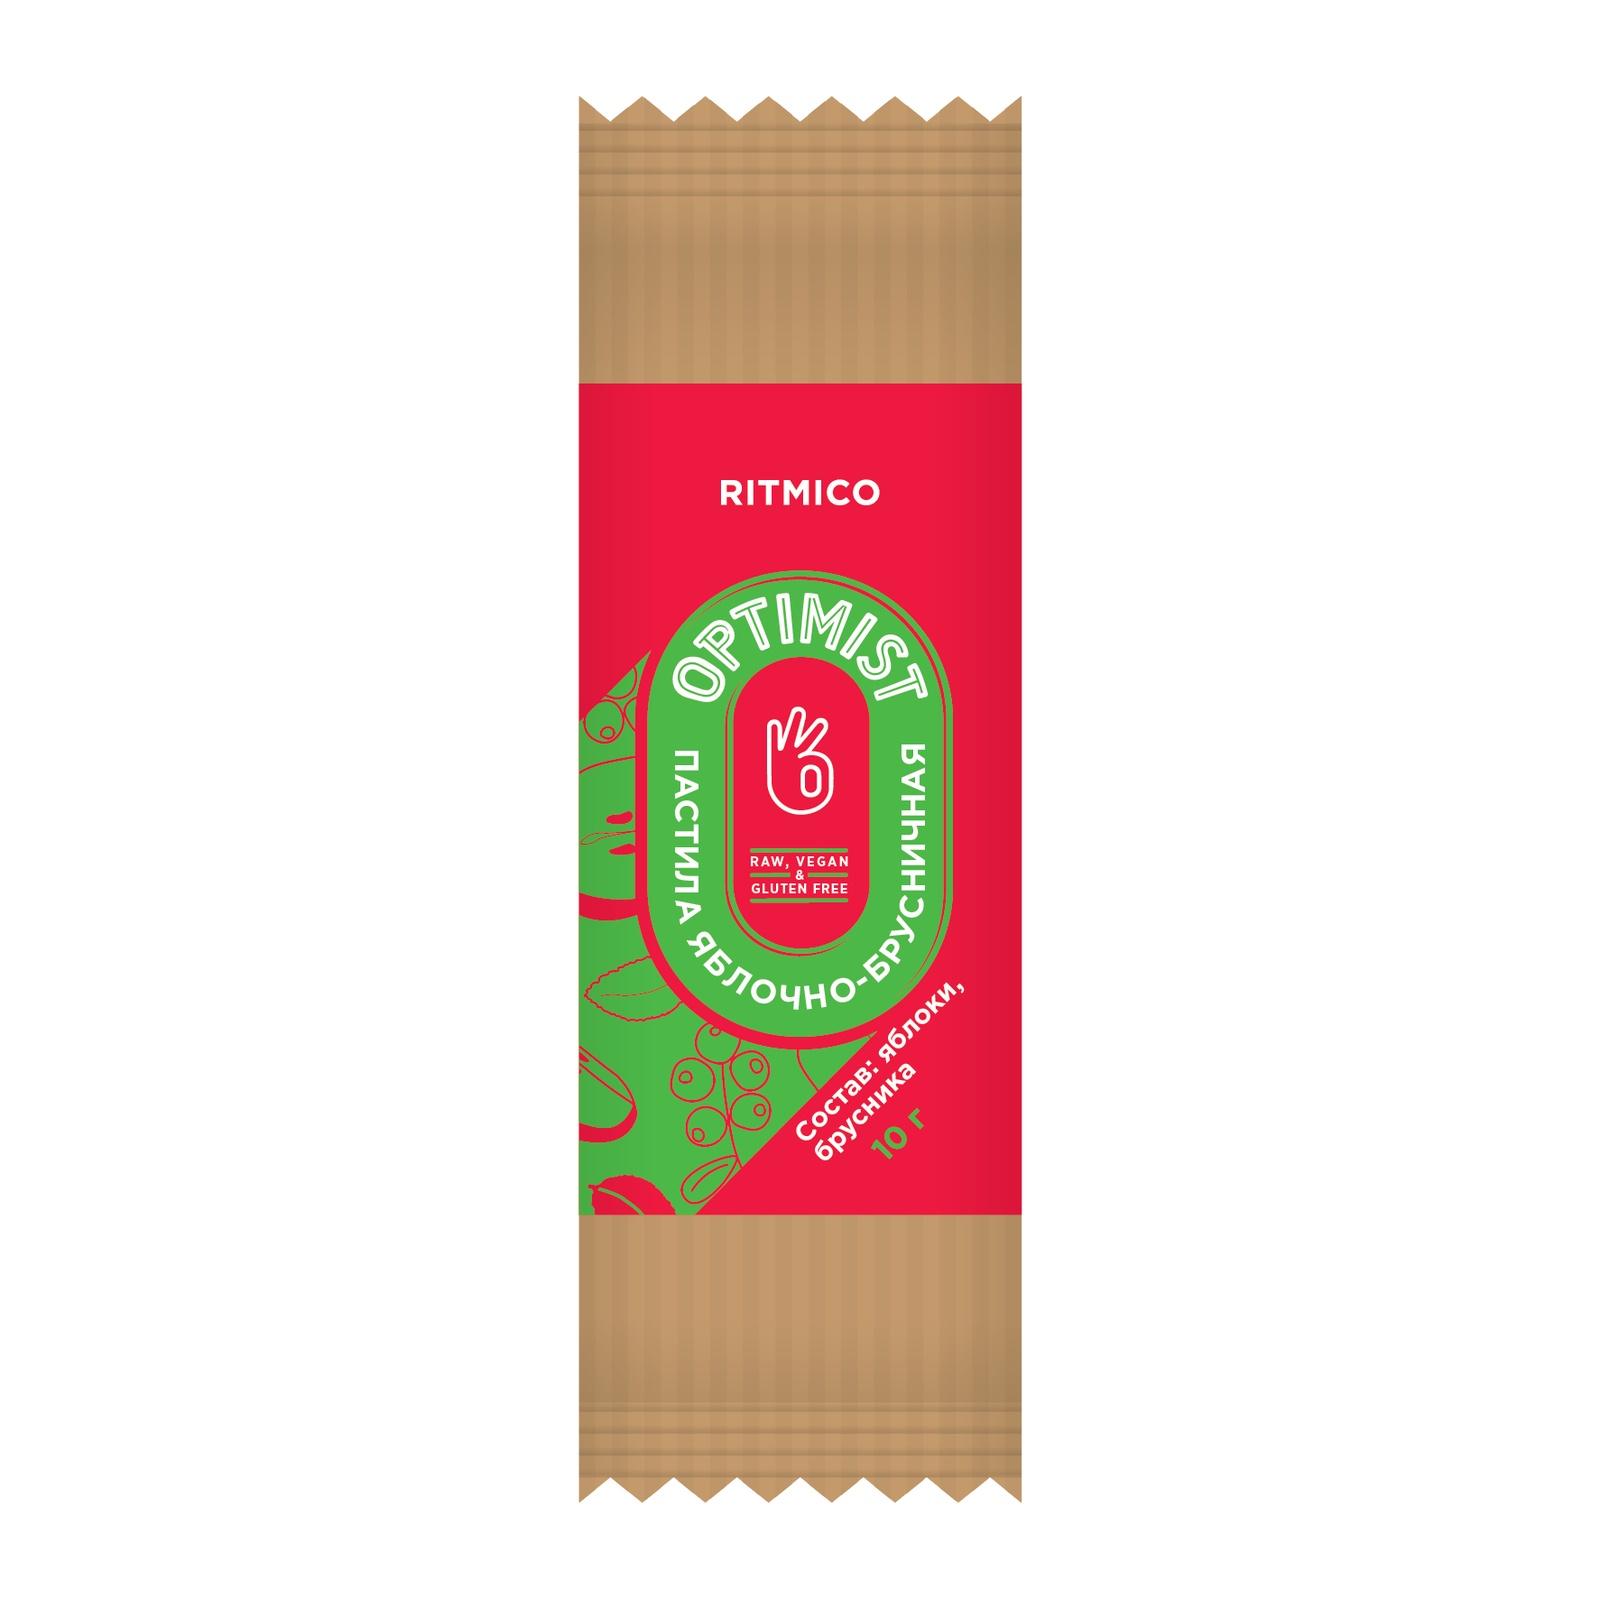 Пастила яблочно-брусничная Optimist, 10 г